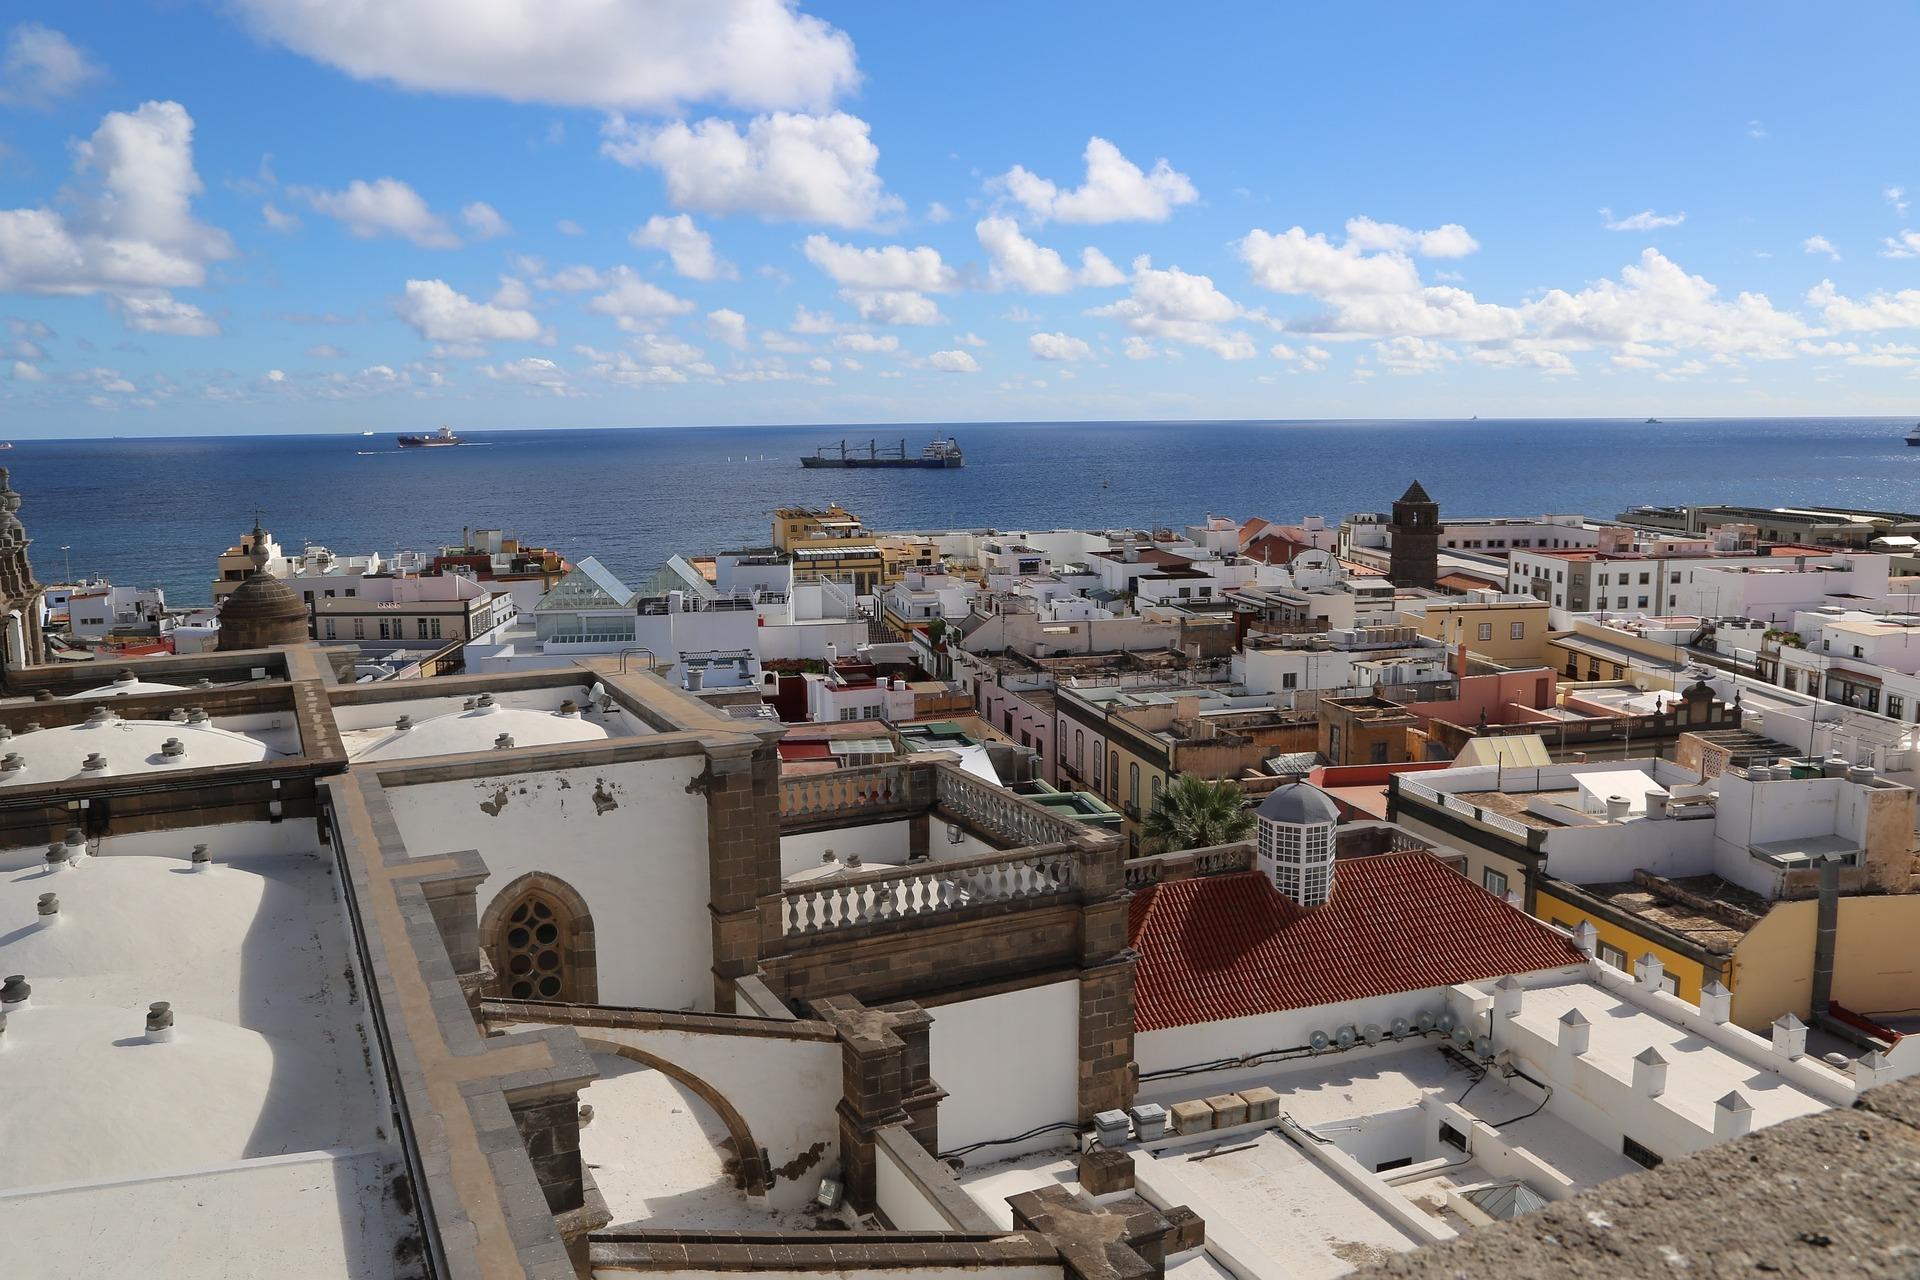 Tag med en tur bag Gran Canarias kulisser